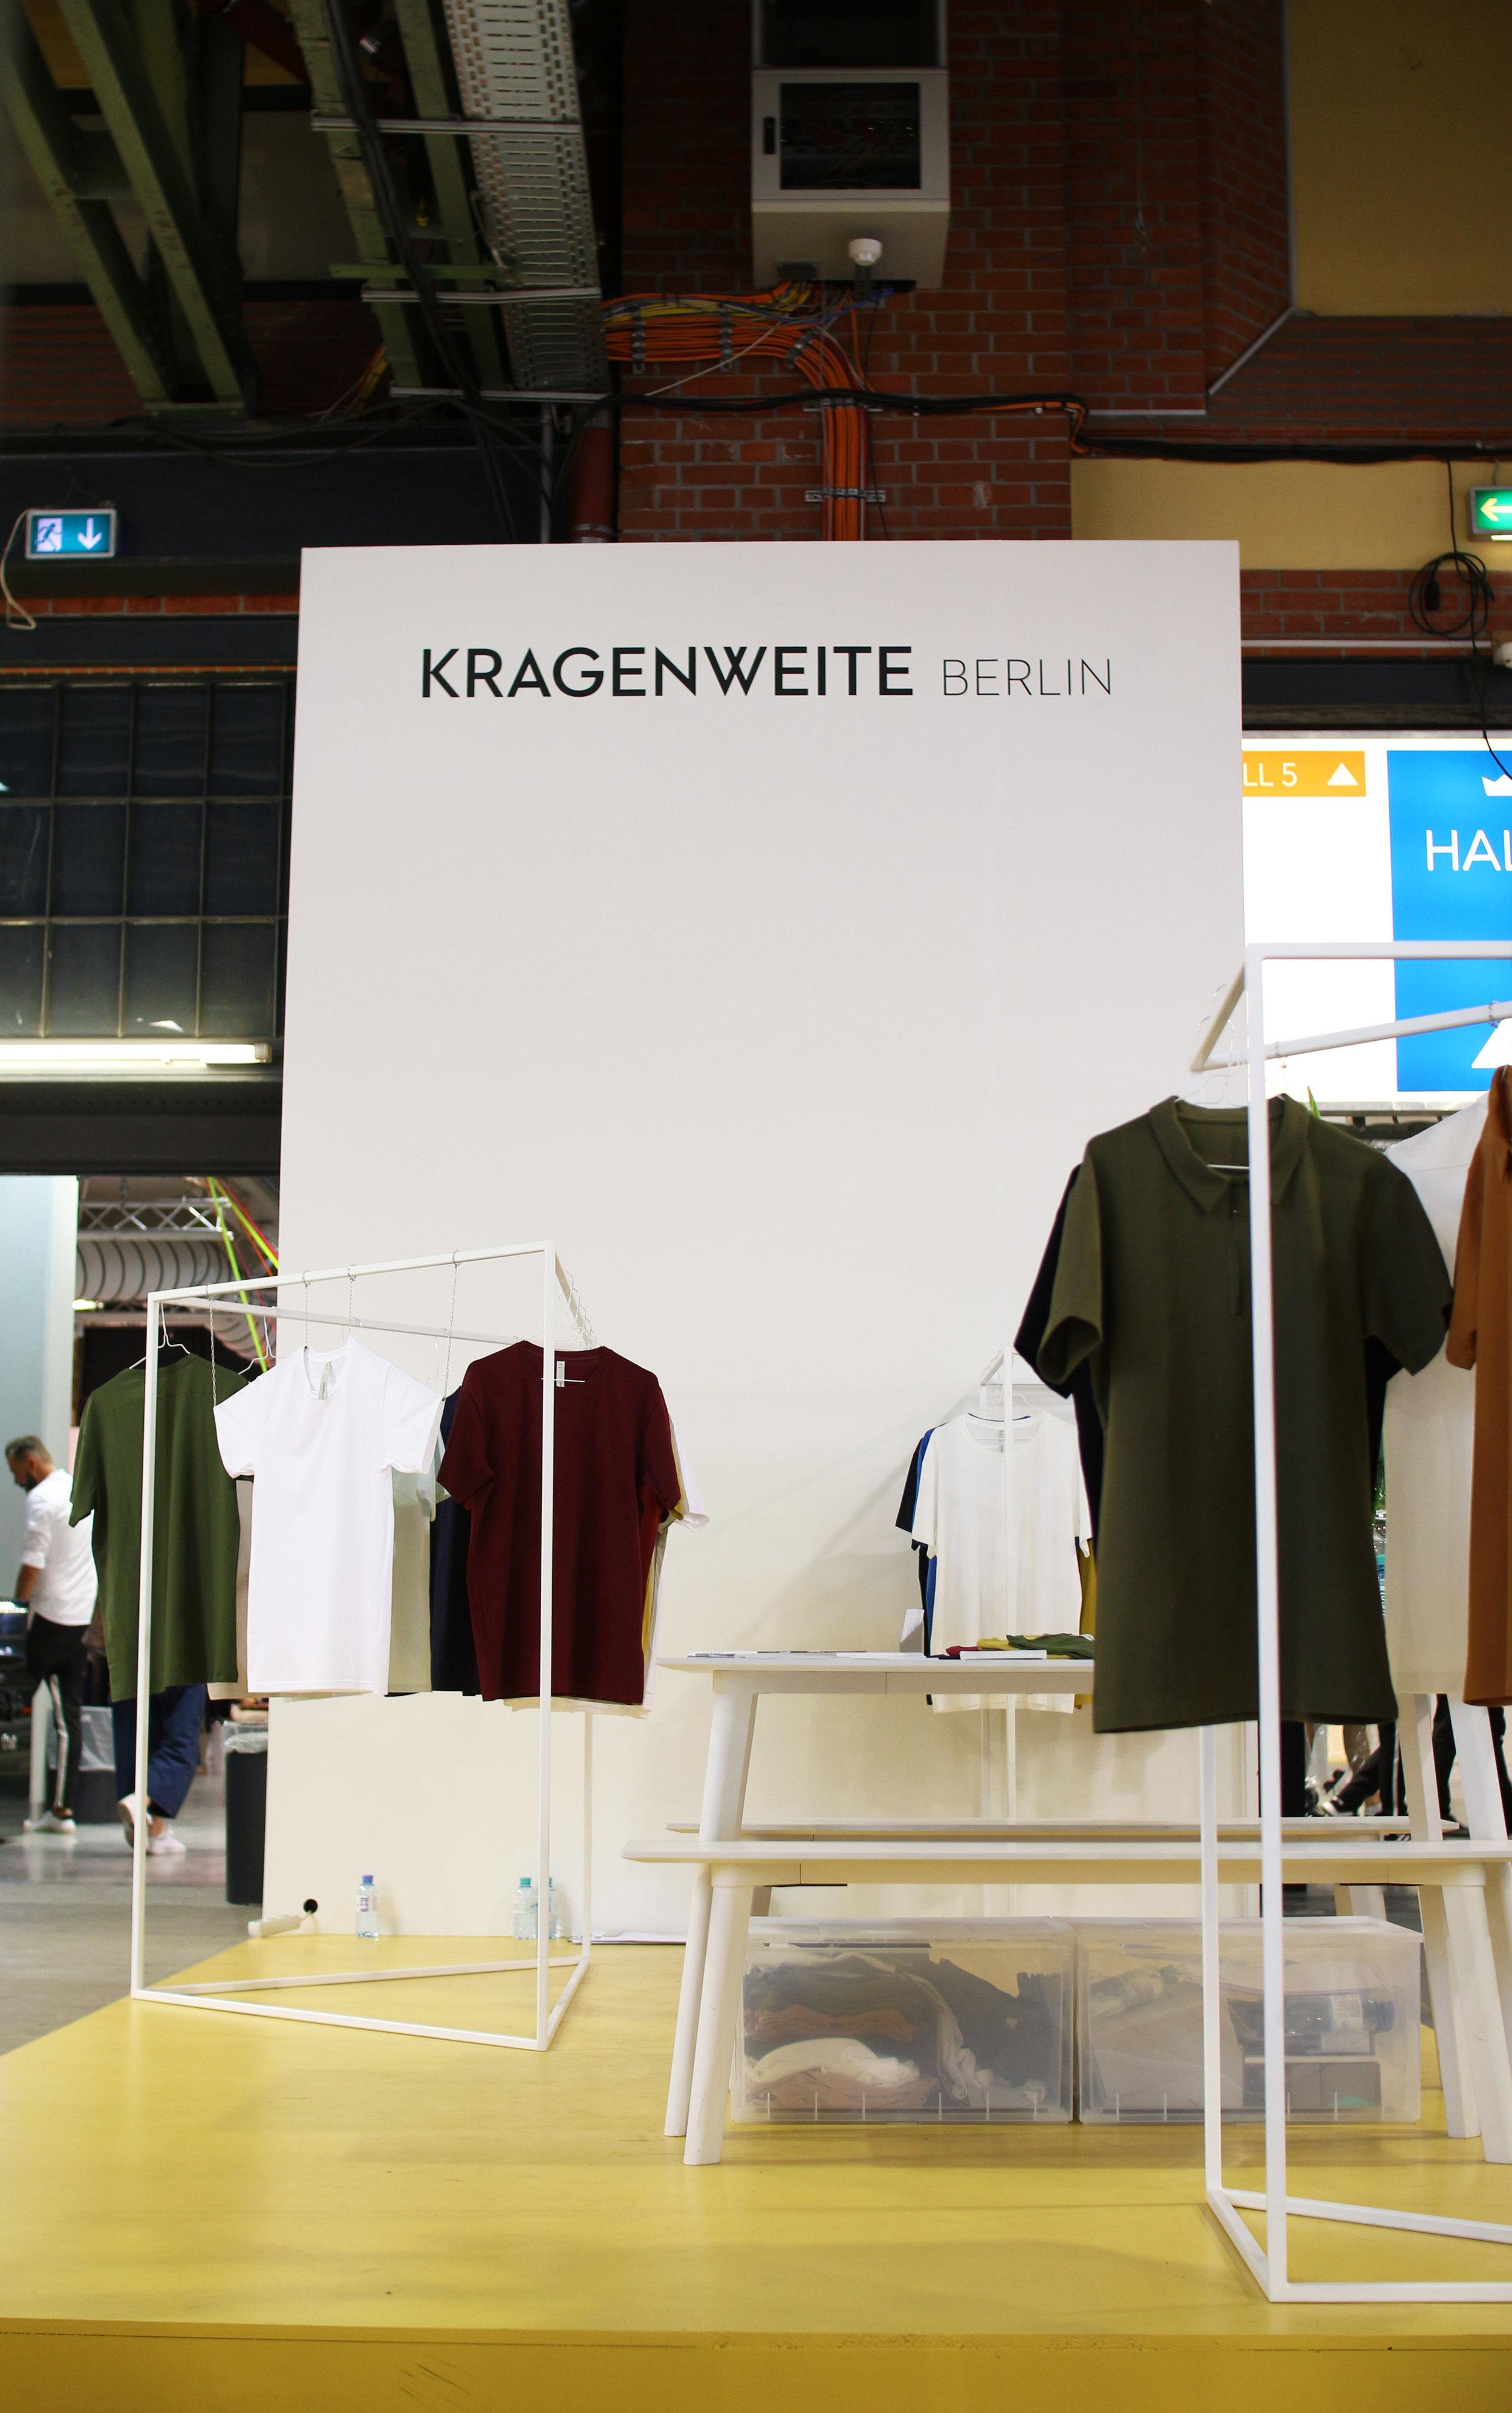 Trunk show display concept for Kragenweite Berlin.  Kragenweite Berlin, Berlin.